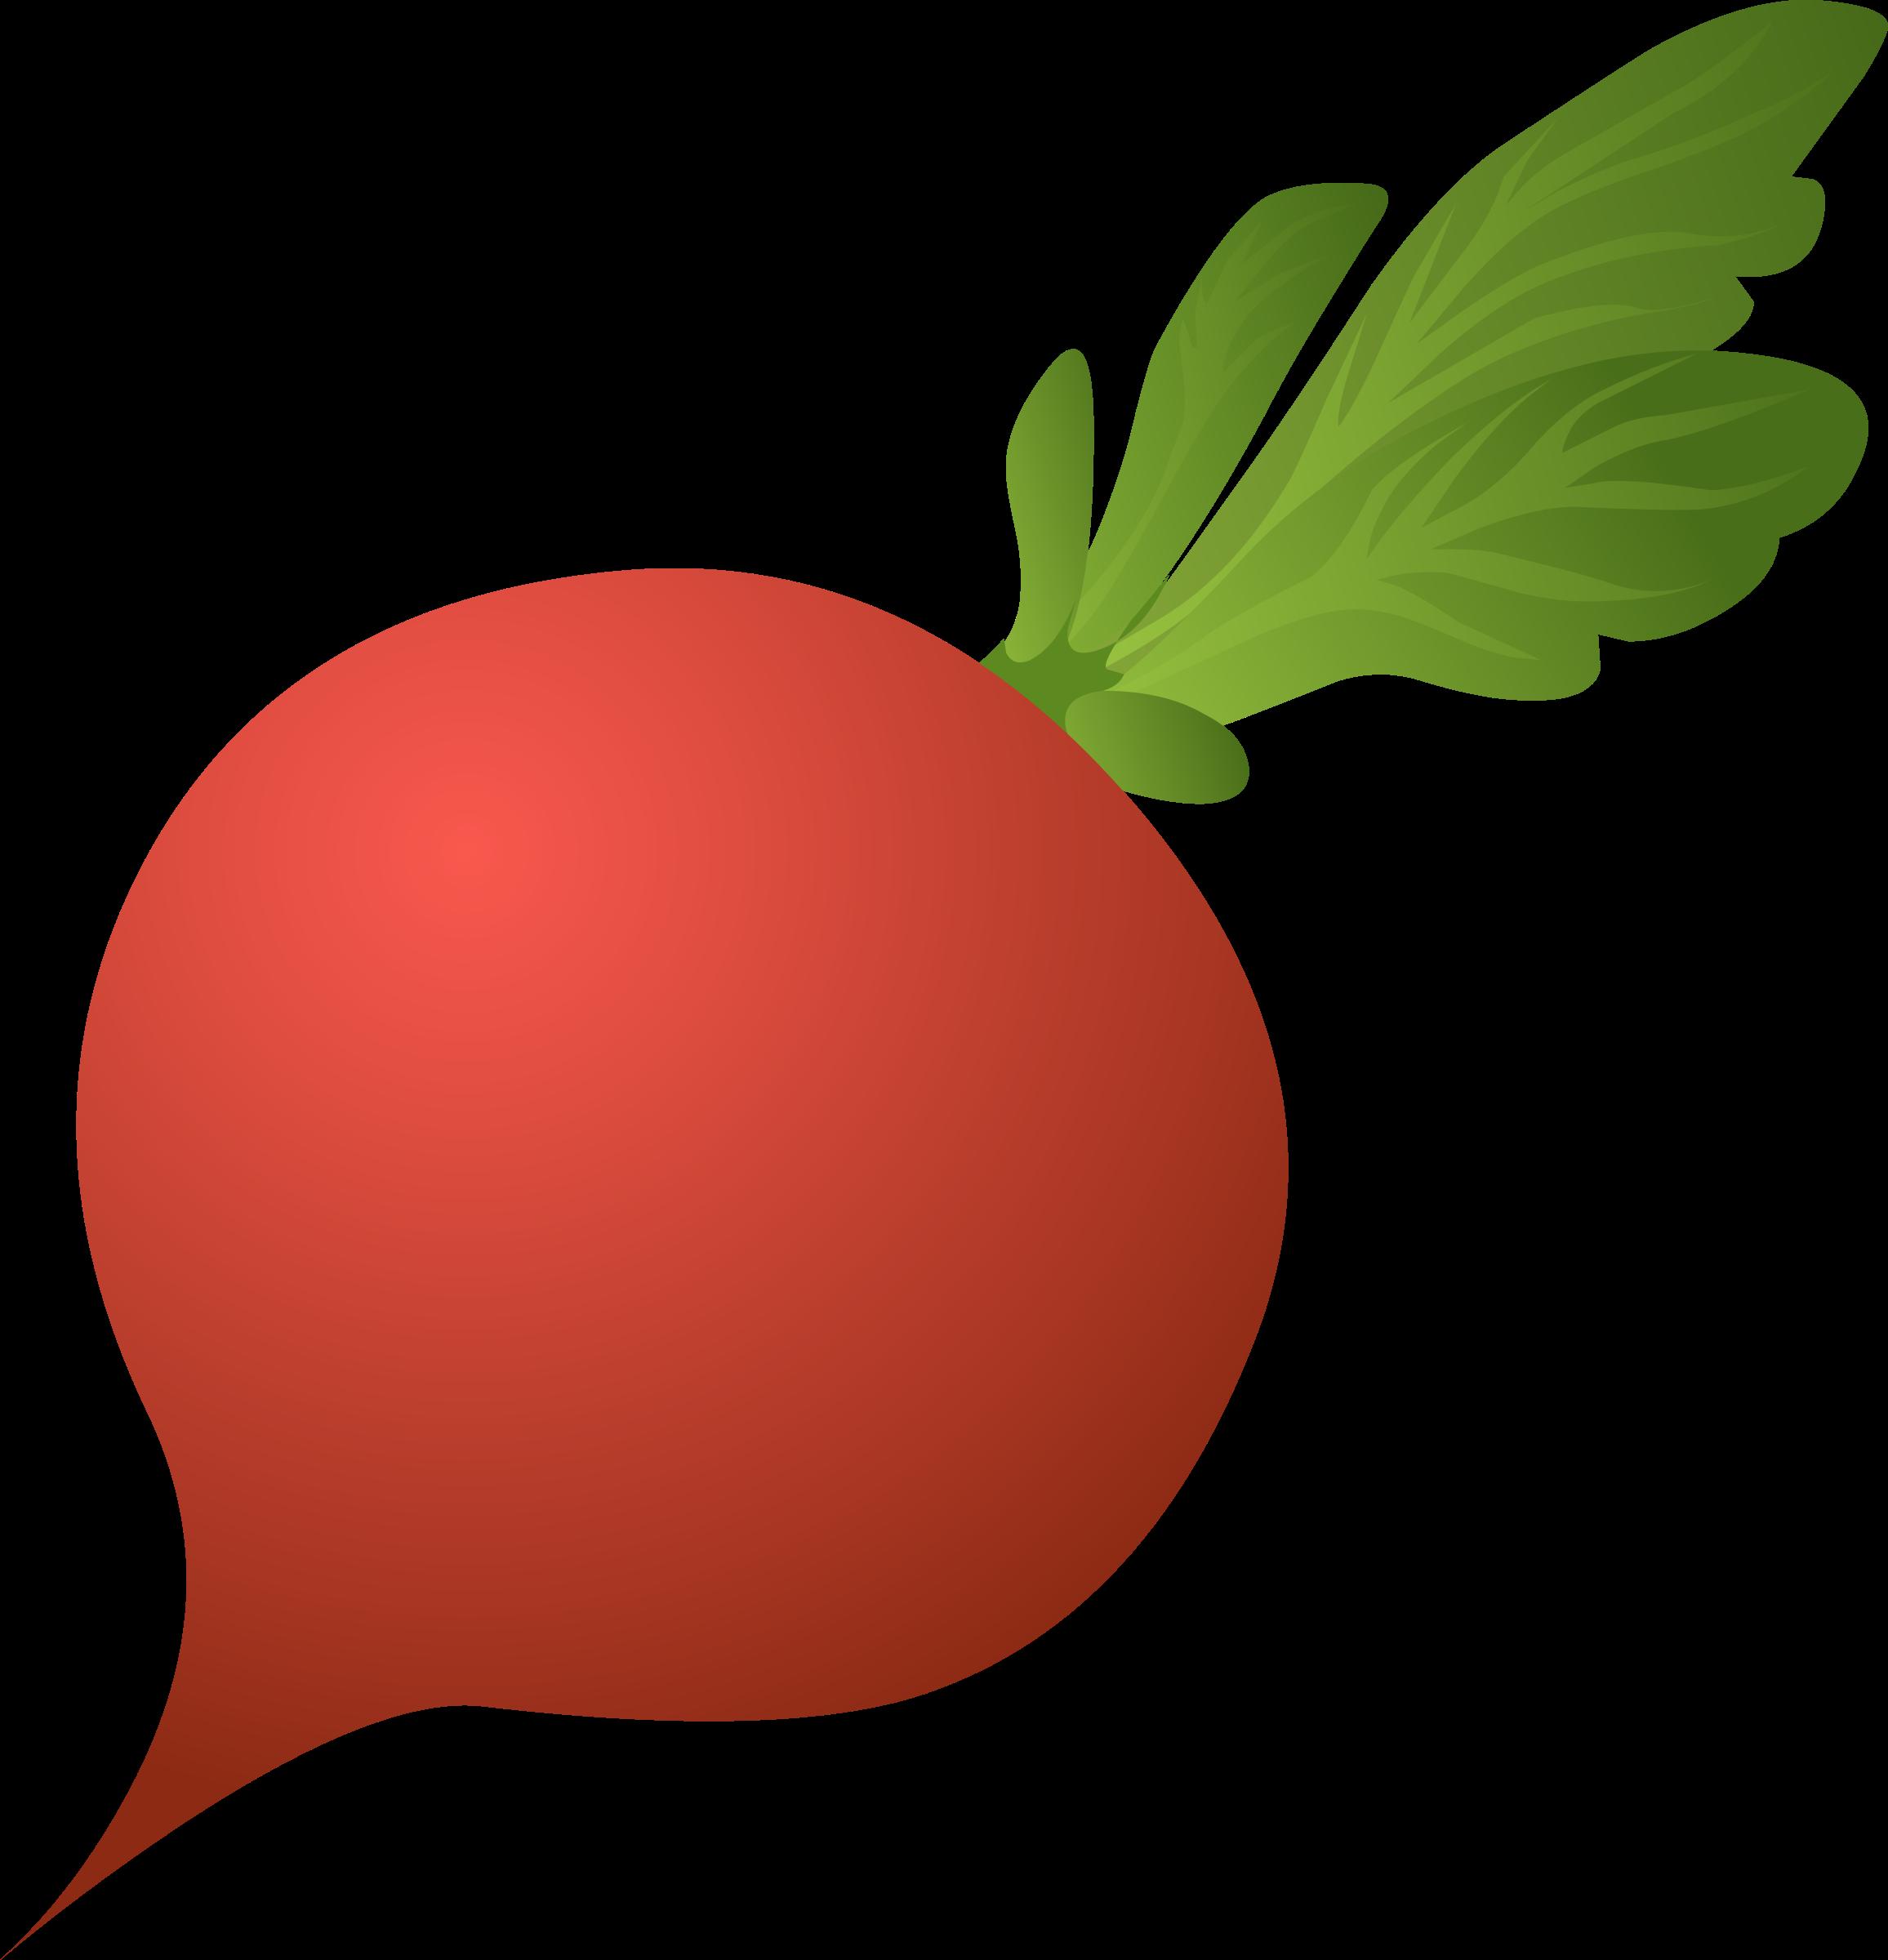 Clipart radish.